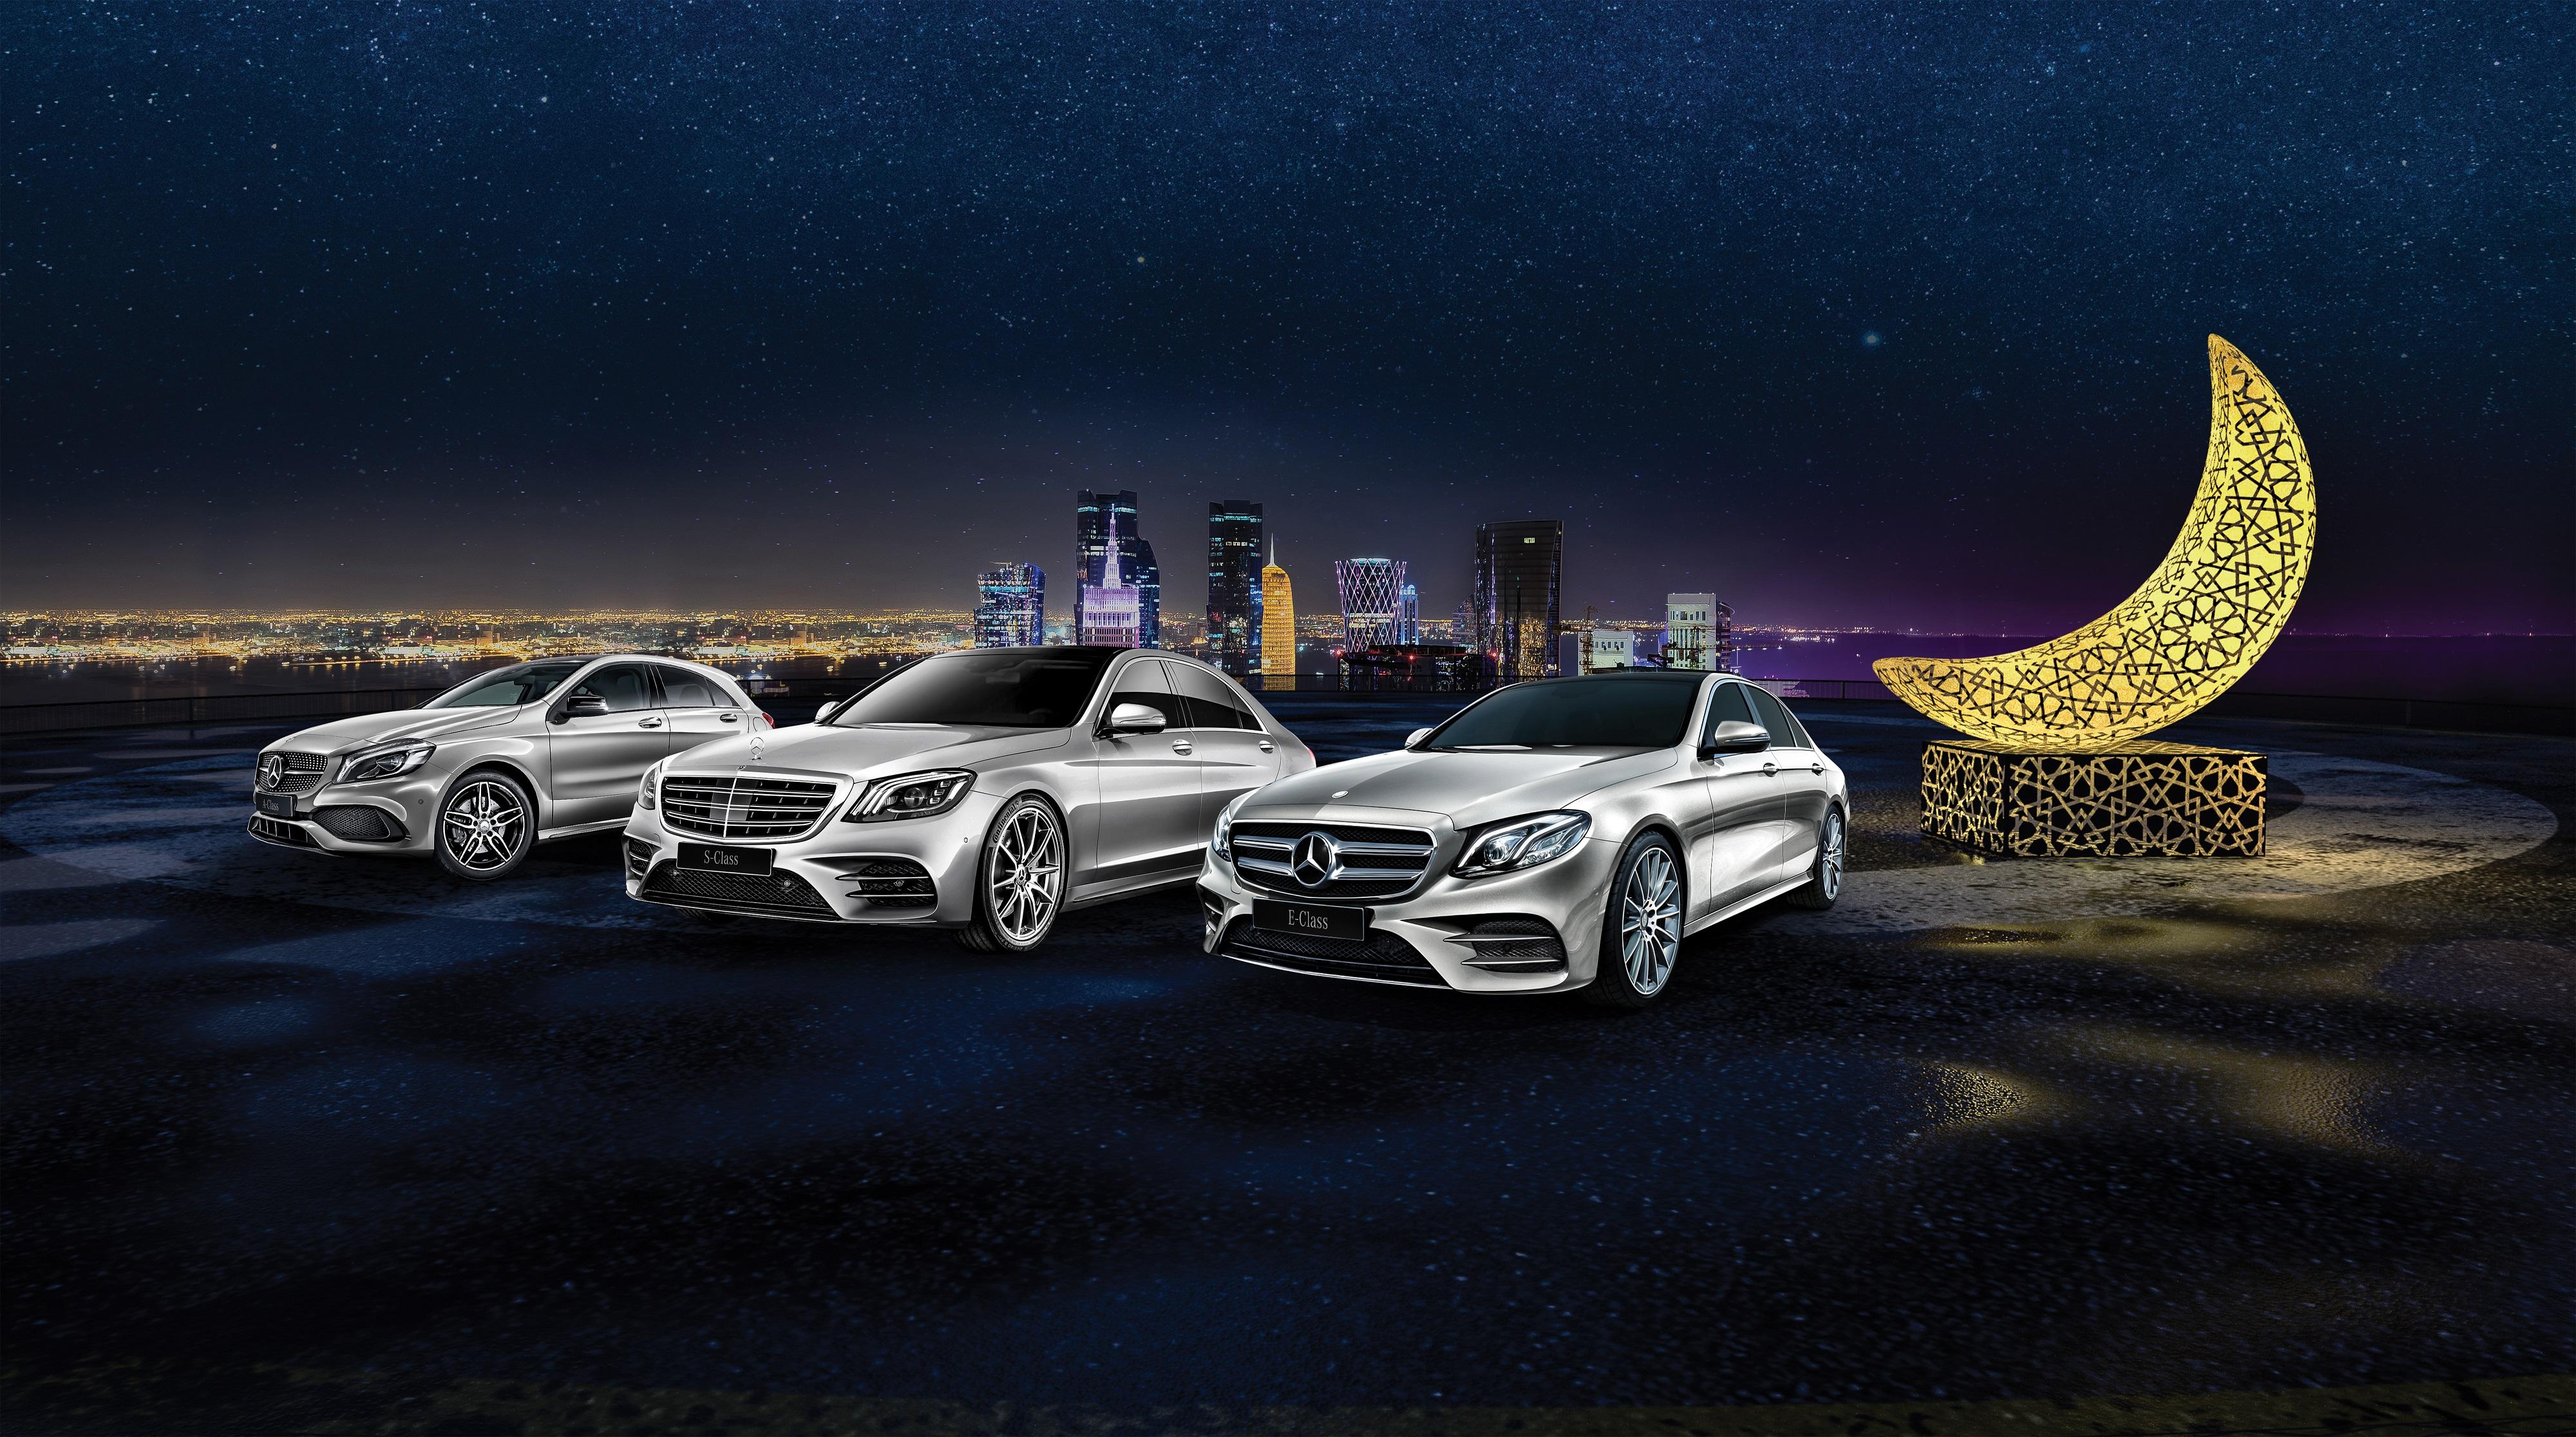 Nasser Bin Khaled Automobiles' Special Offer on Mercedes-Benz Cars this Ramadan